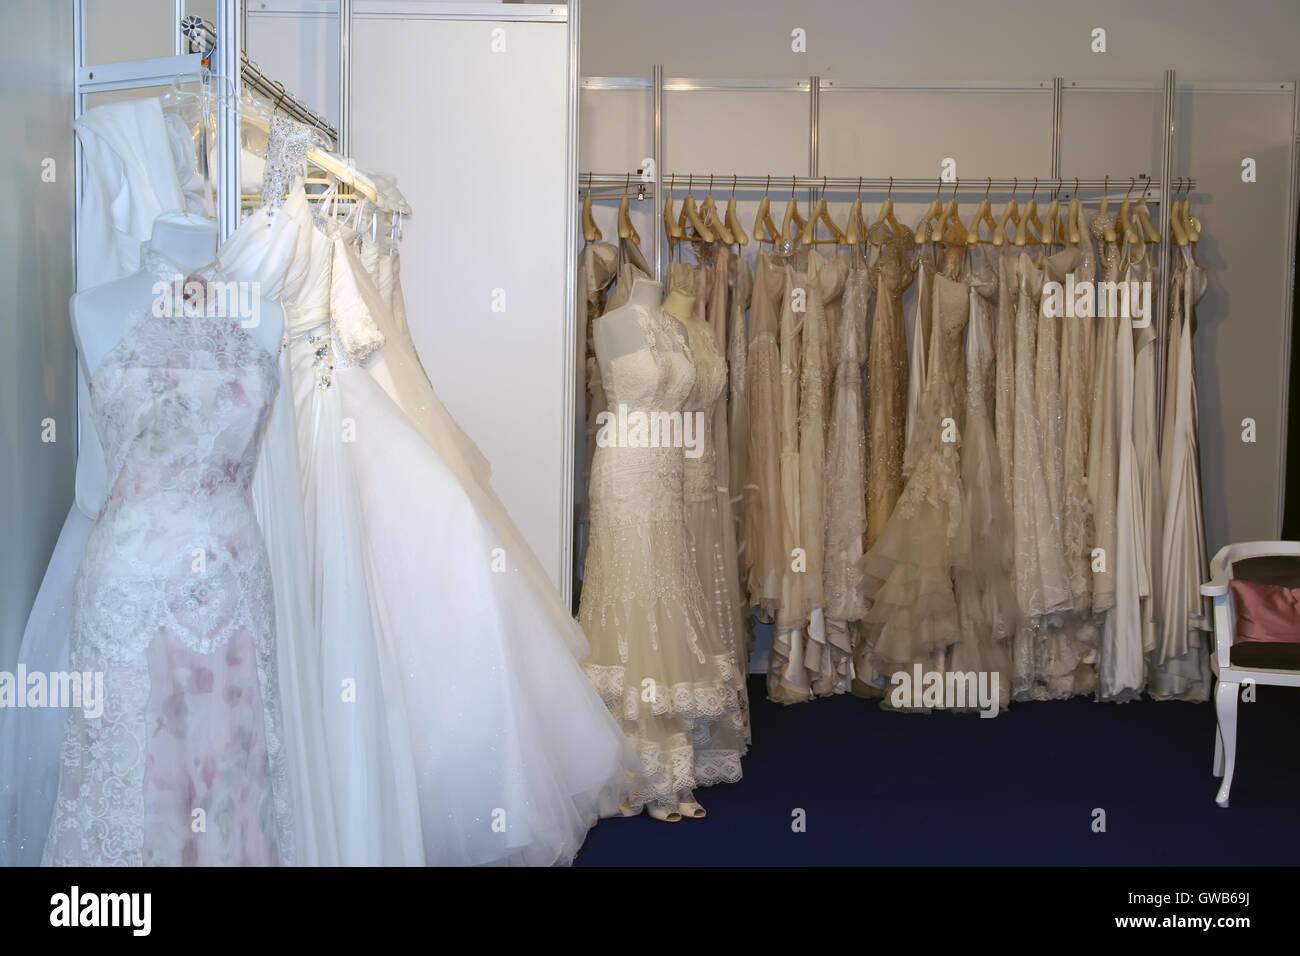 White Wedding Dresses Bunch Of Wedding Dresses Stock Photo Alamy,Wedding Dress Makers Sydney